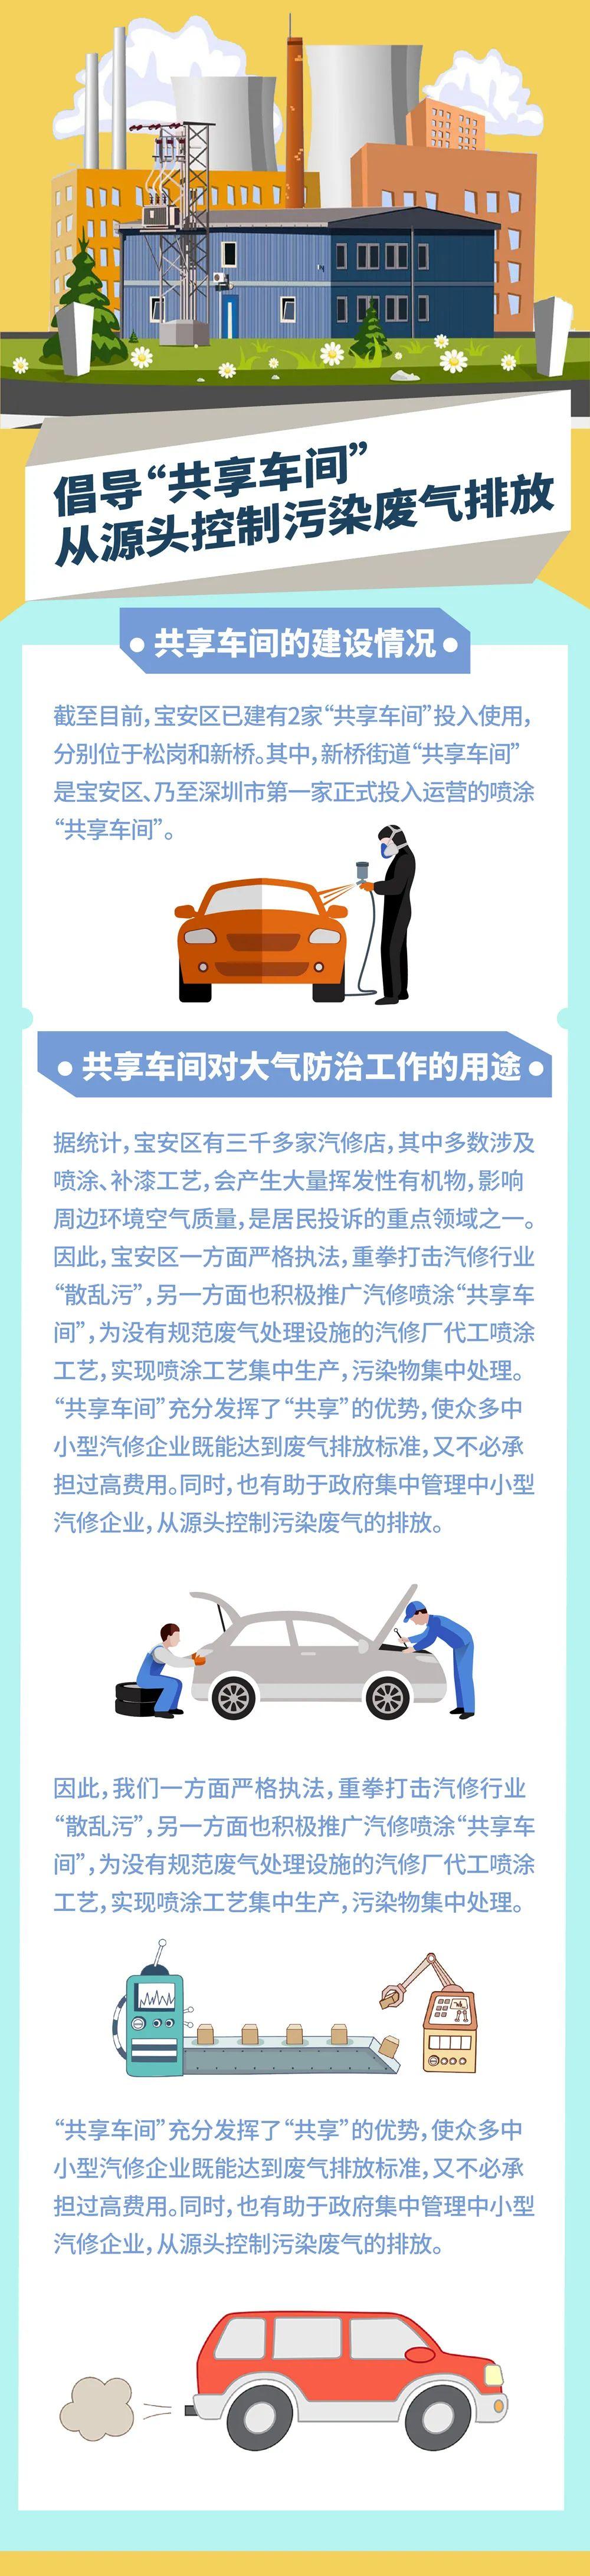 http://www.iitime.cn/yongche/142090.html